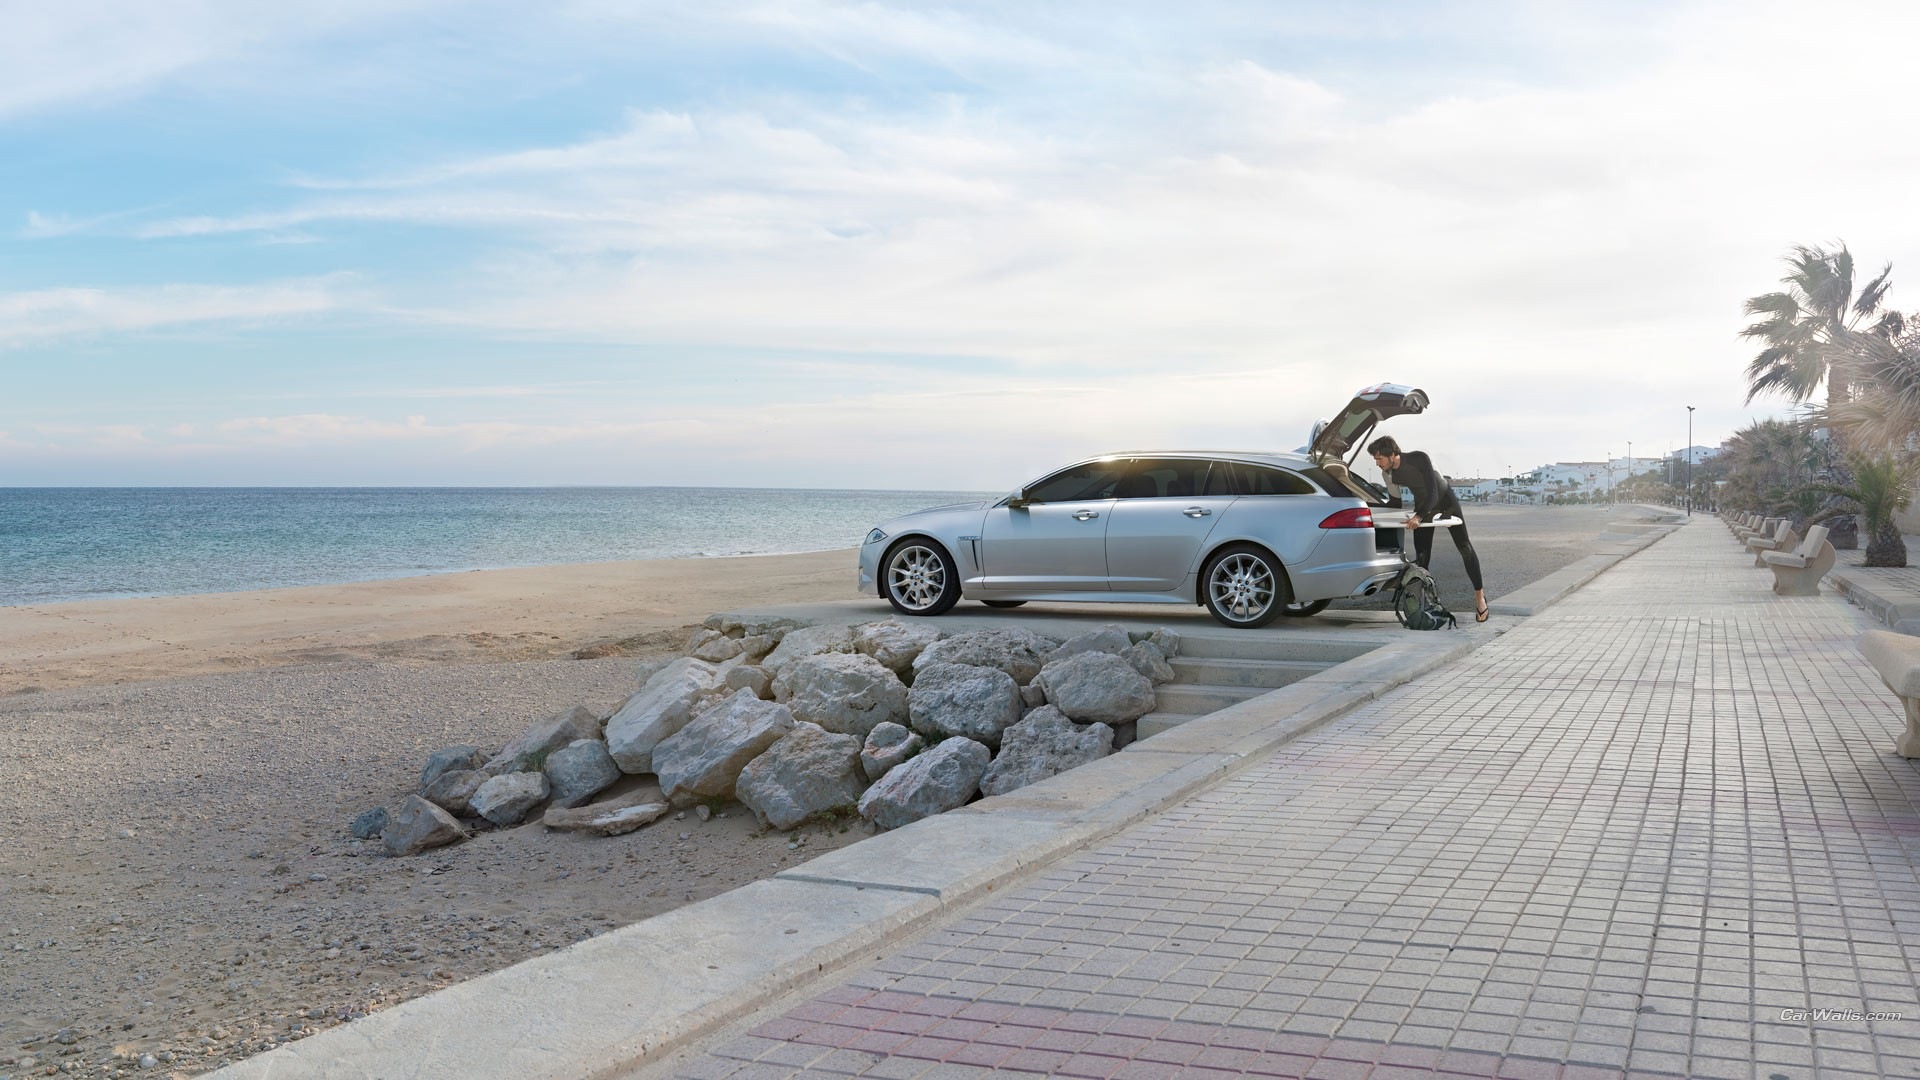 General 1920x1080 Jaguar XF beach sea car silver cars vehicle Jaguar Jaguar (car) men British cars